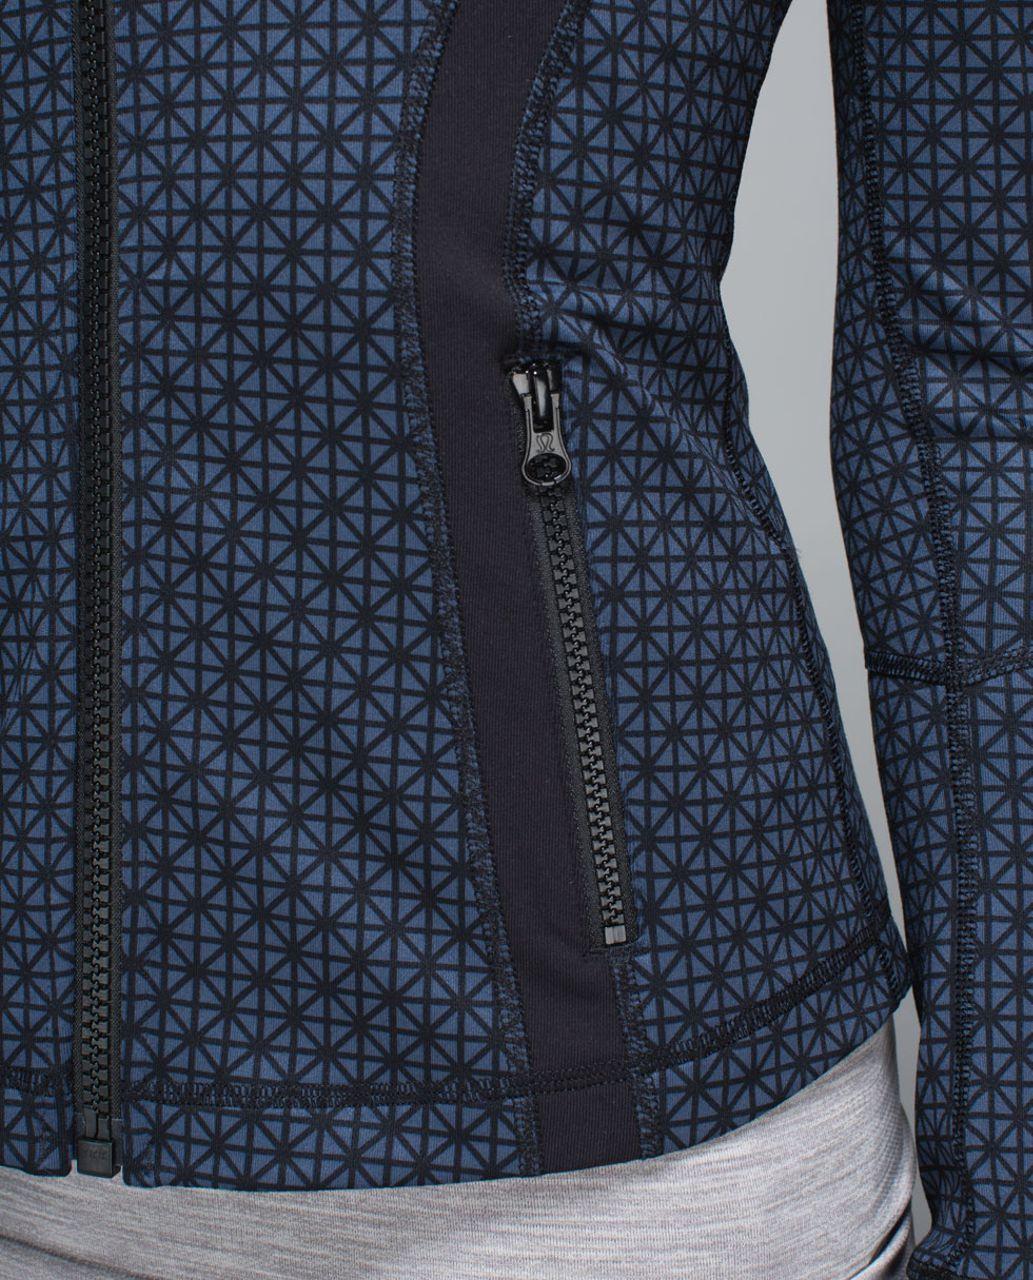 Lululemon Define Jacket - Tri Geo Printed Inkwell Black / Black